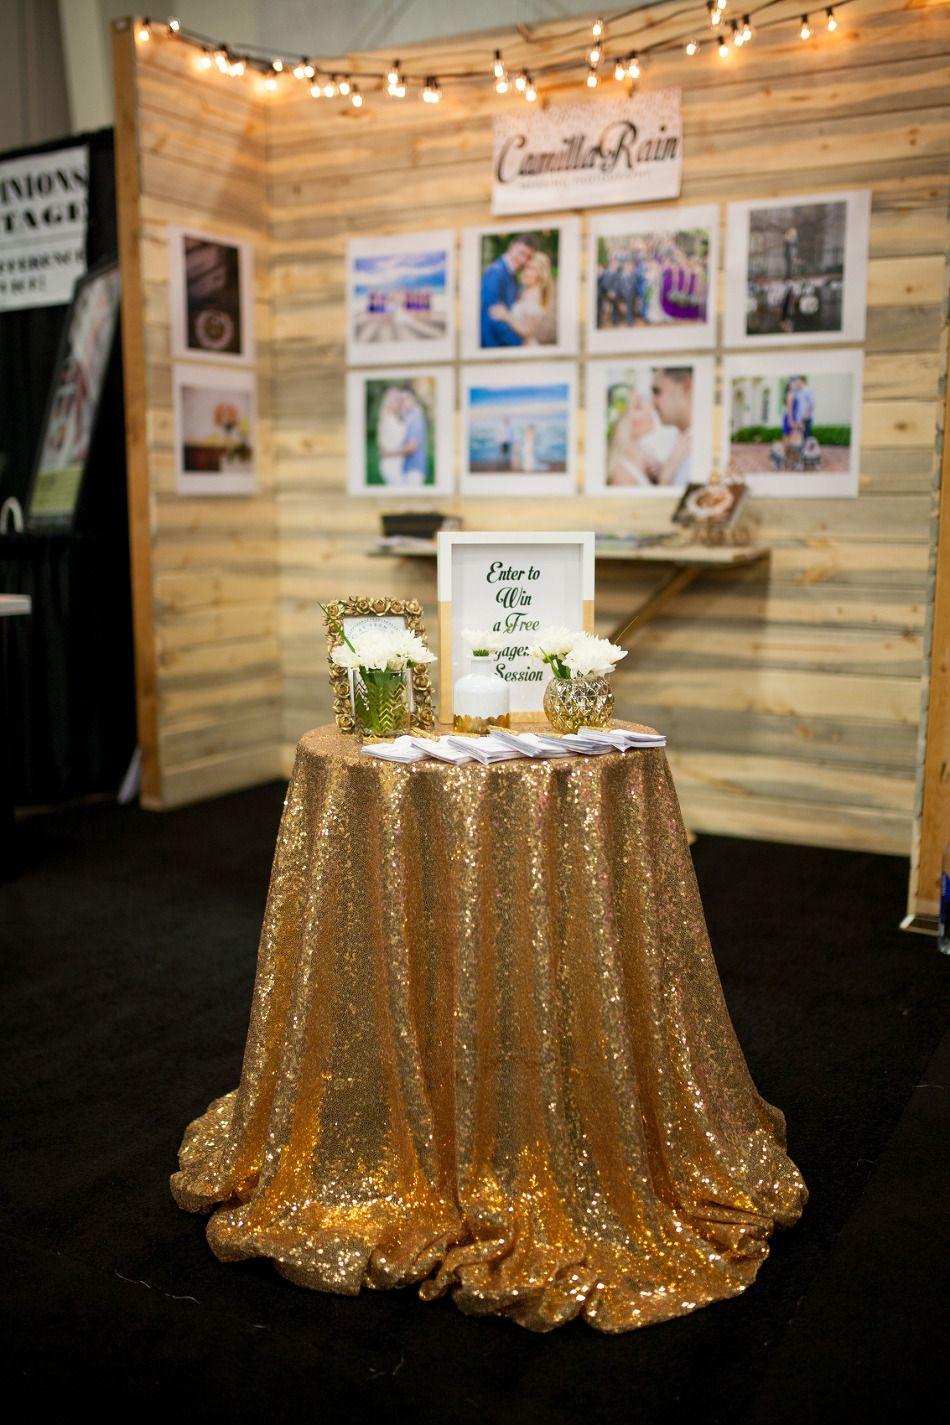 Wedding Photographer Booth Setup at a Bridal Show Bridal Show